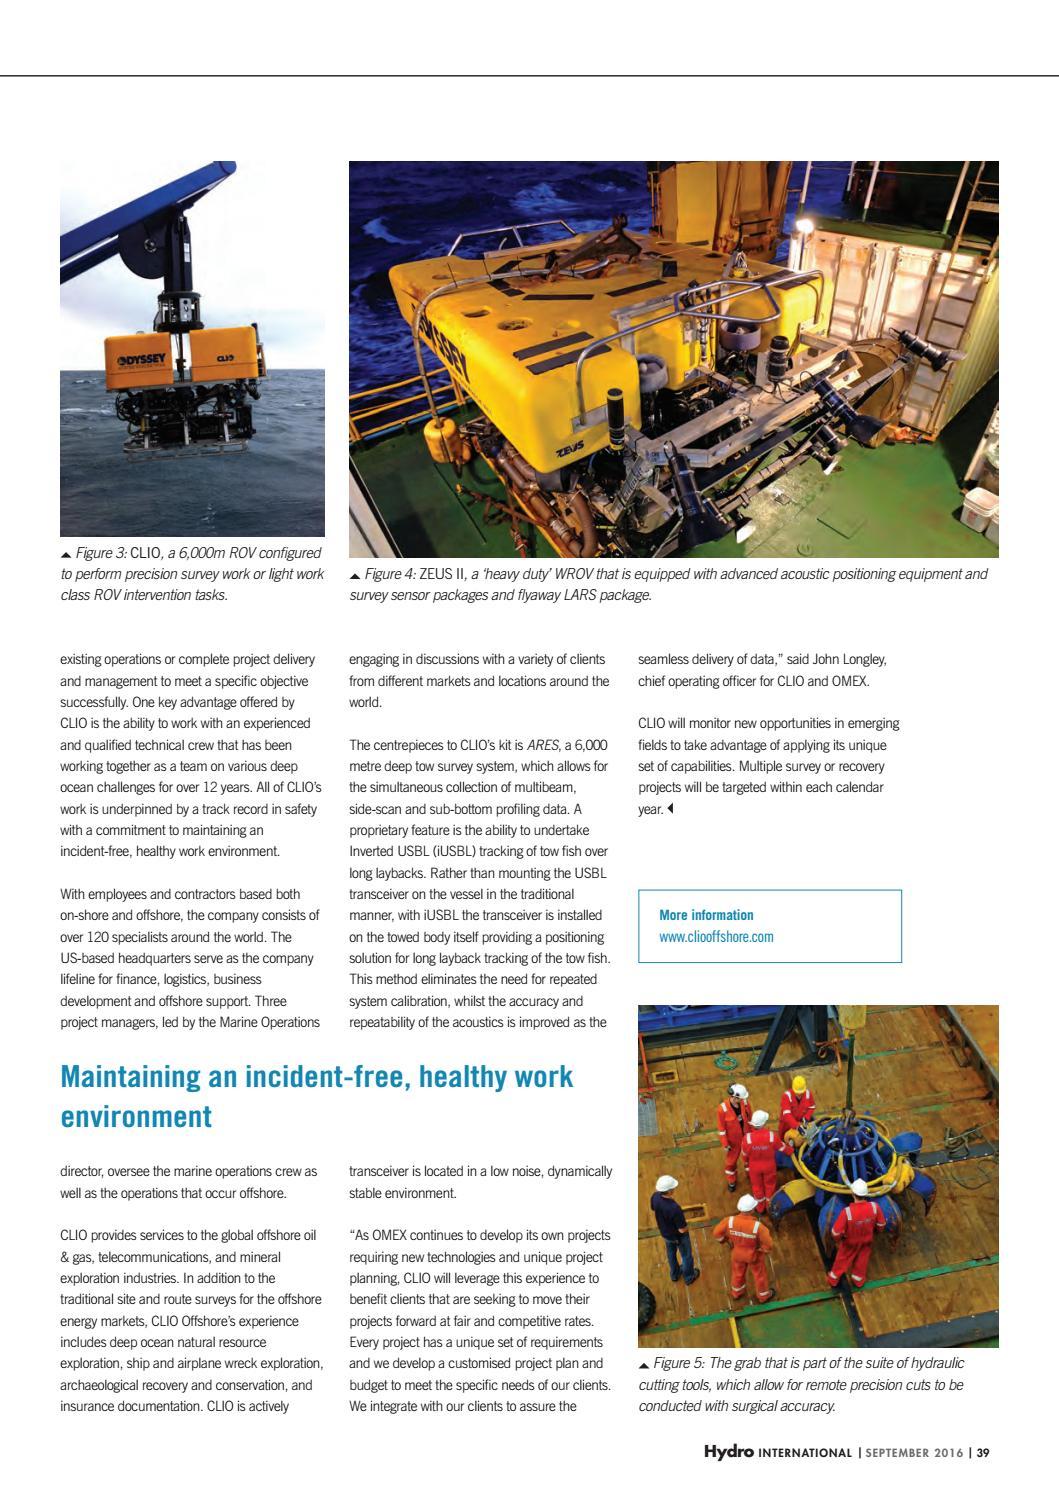 Hydro international september 2016 by Geomares Publishing